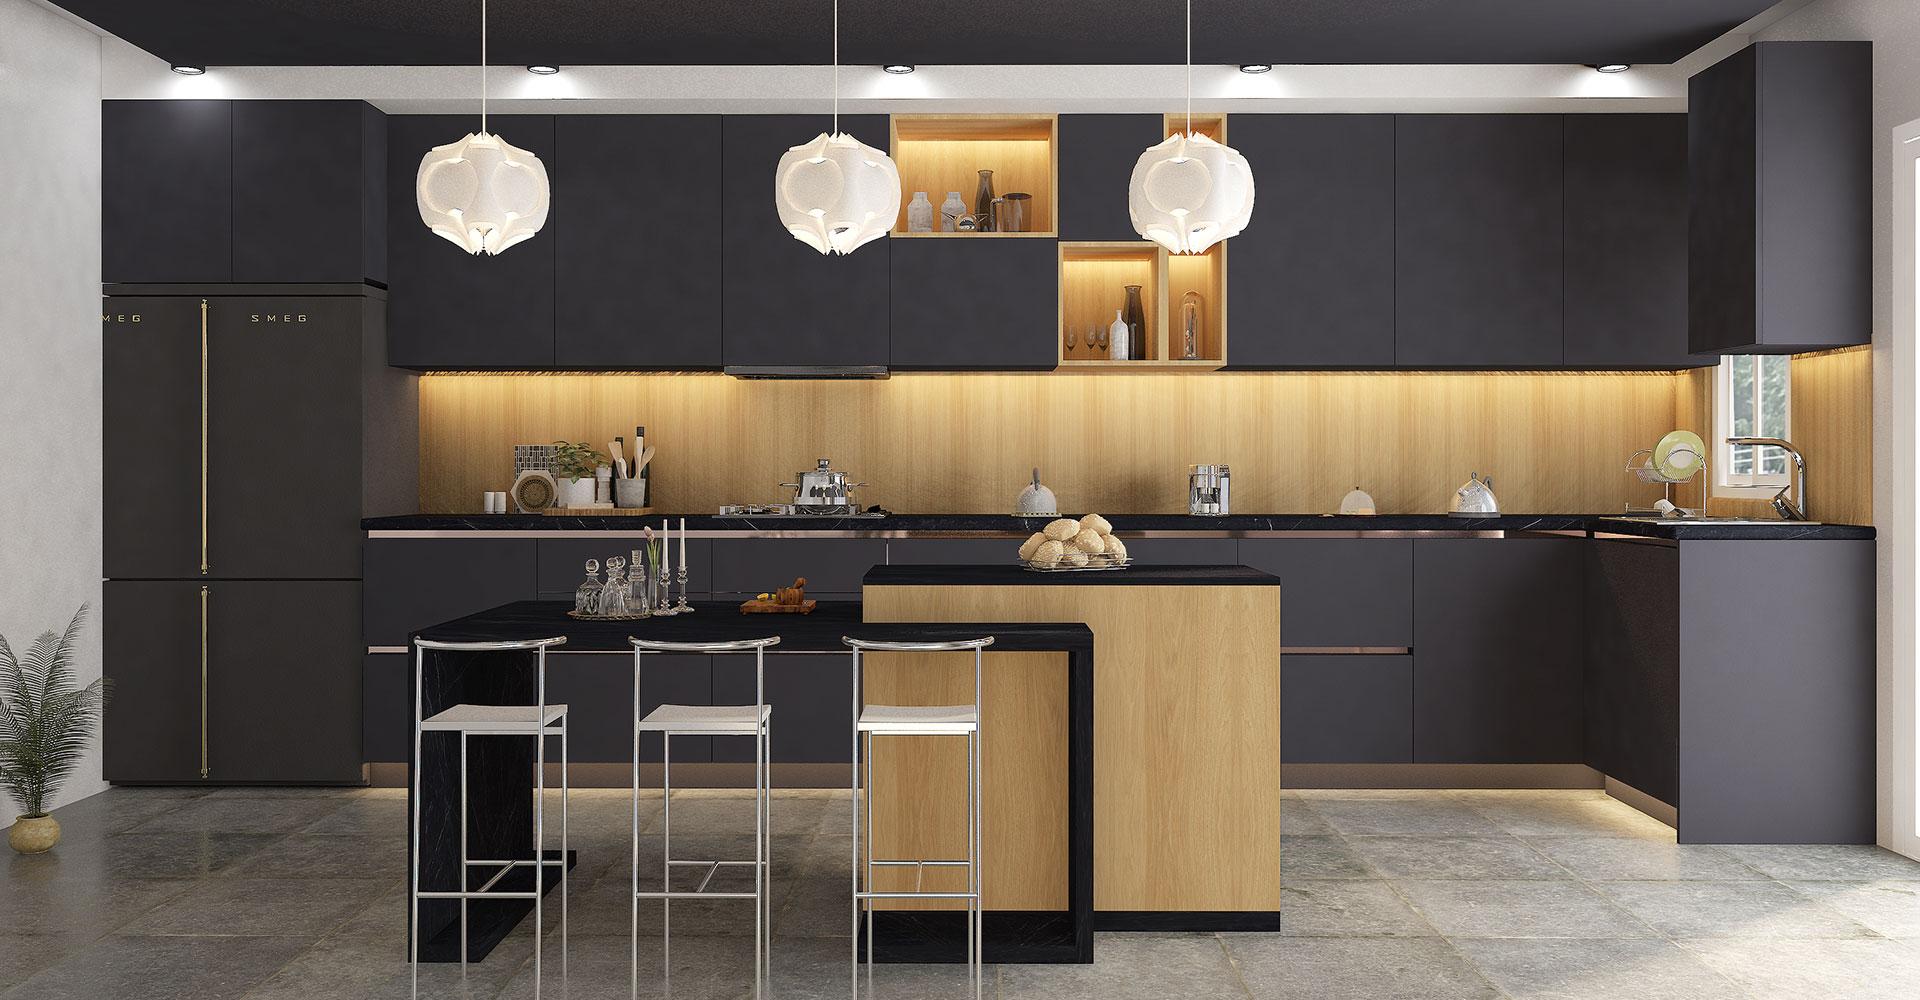 Top 13 Luxurious Kitchen Designs of 2021